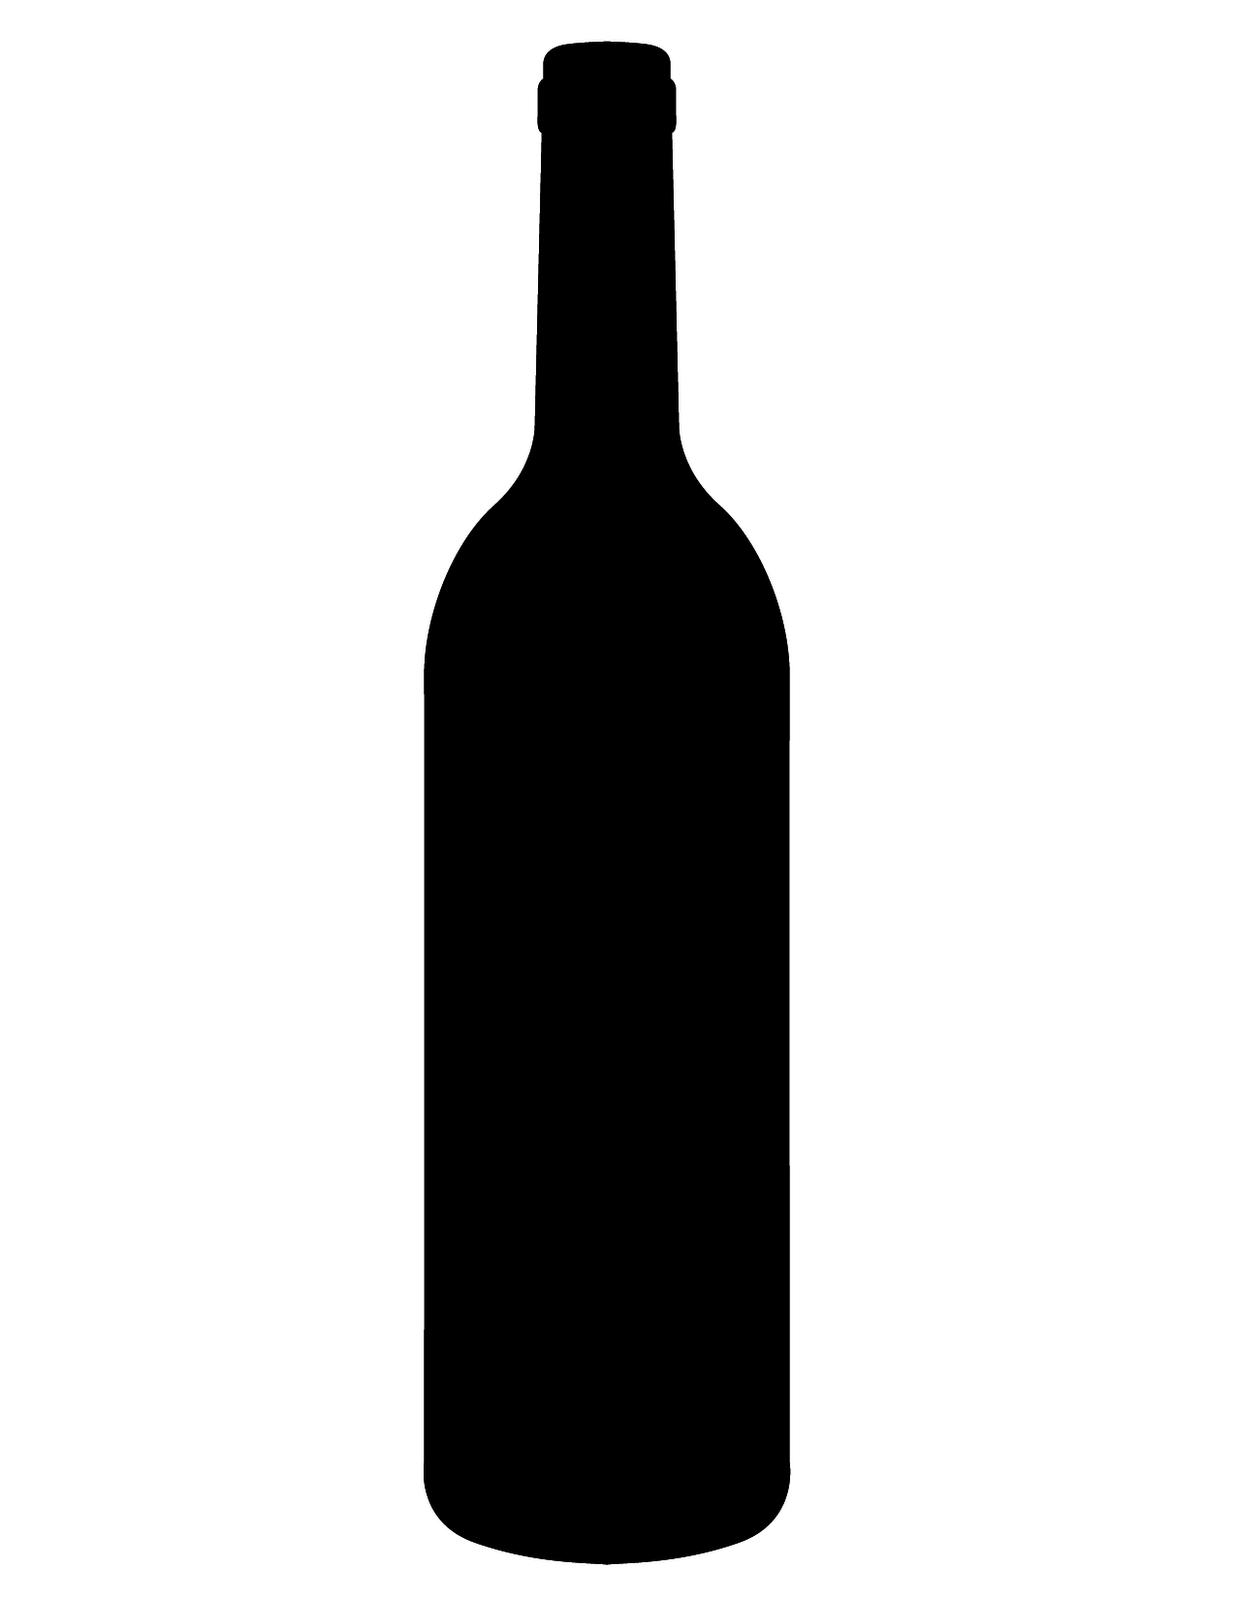 $100 Bottle (Vision Loss Alliance)